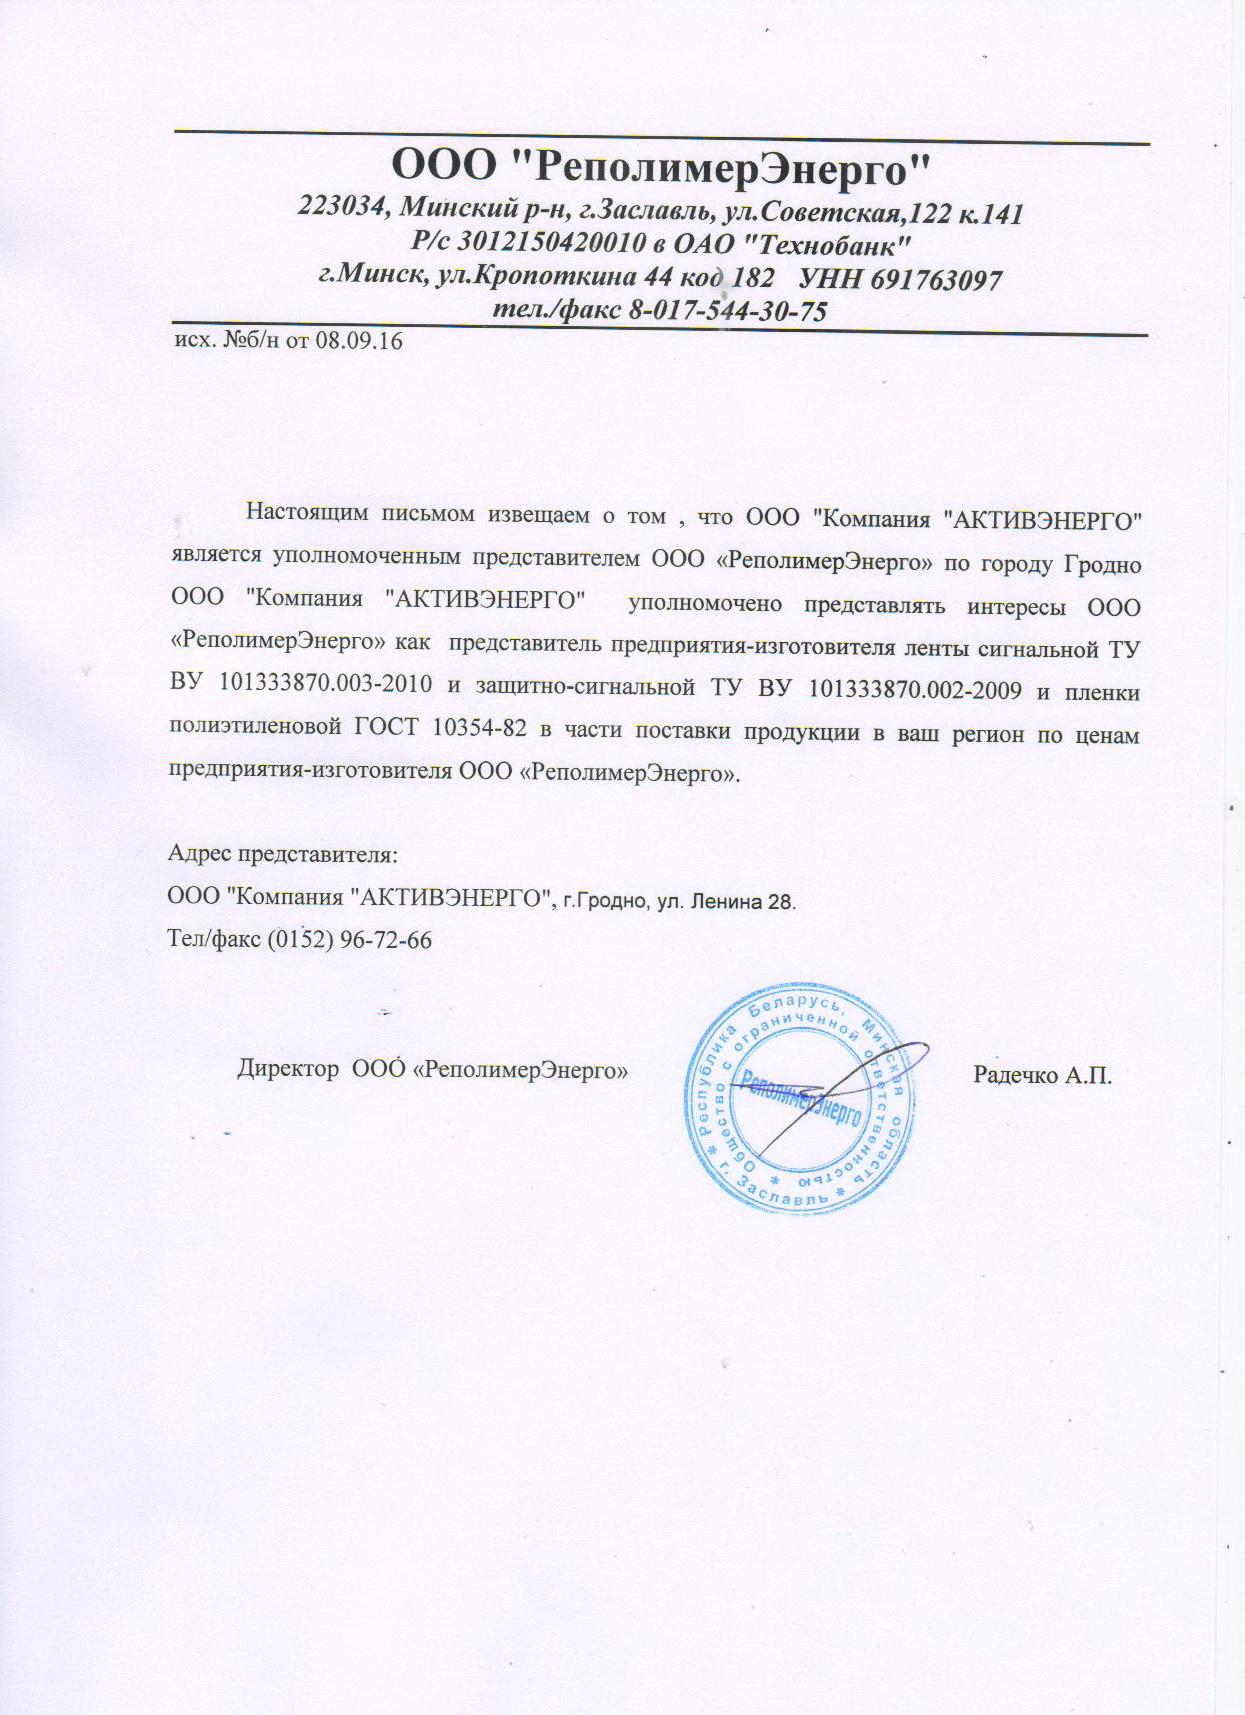 sertifikat-repolimirenergo